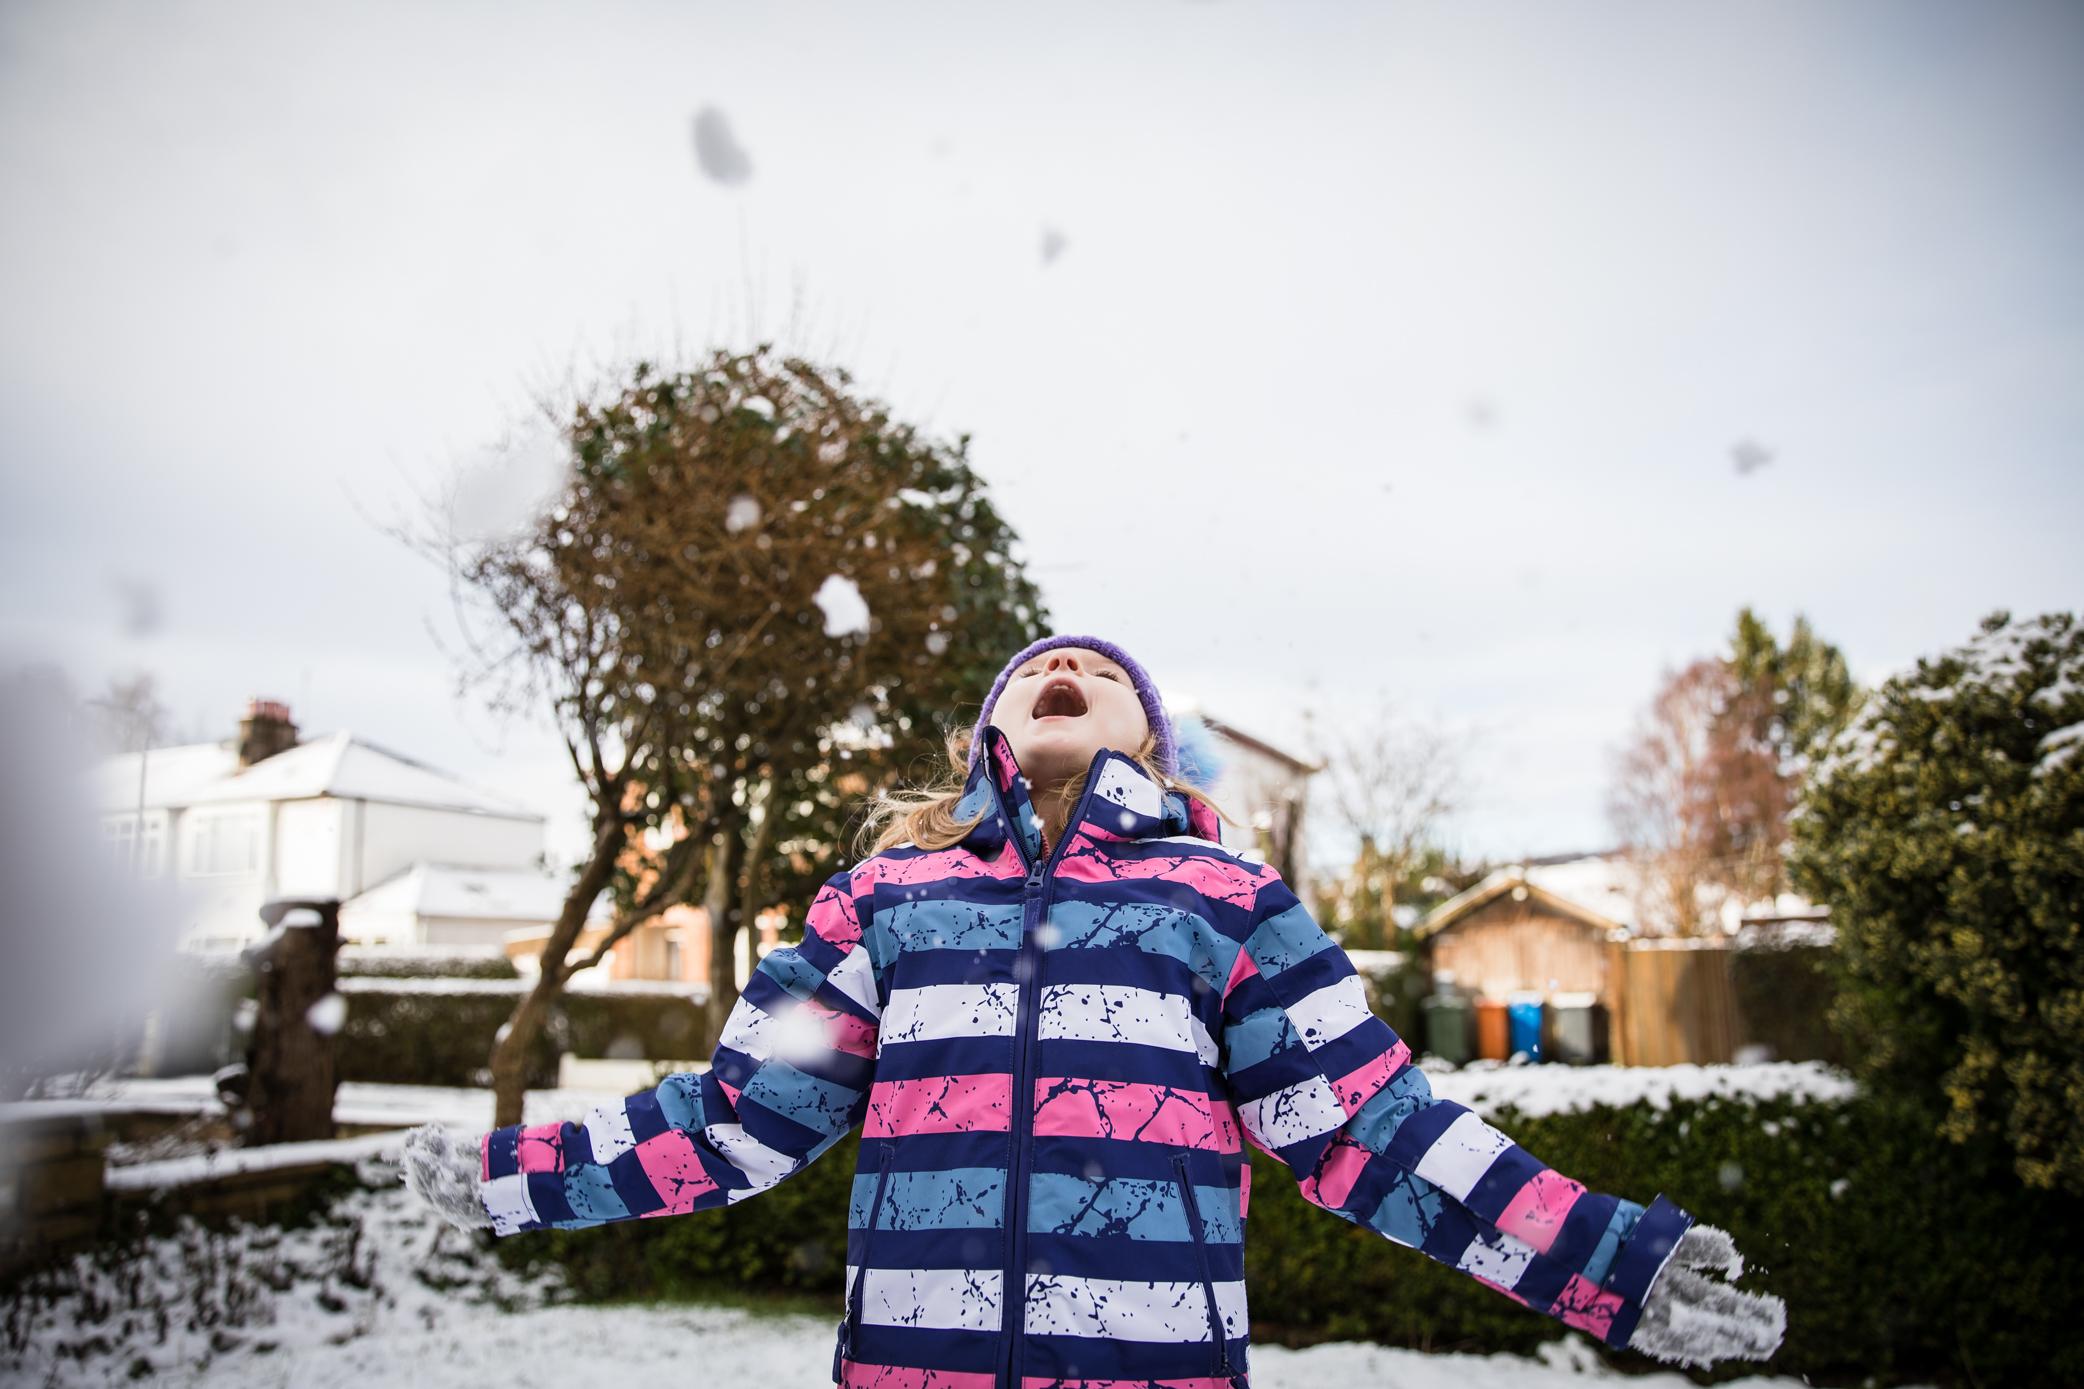 Lets throw snow!